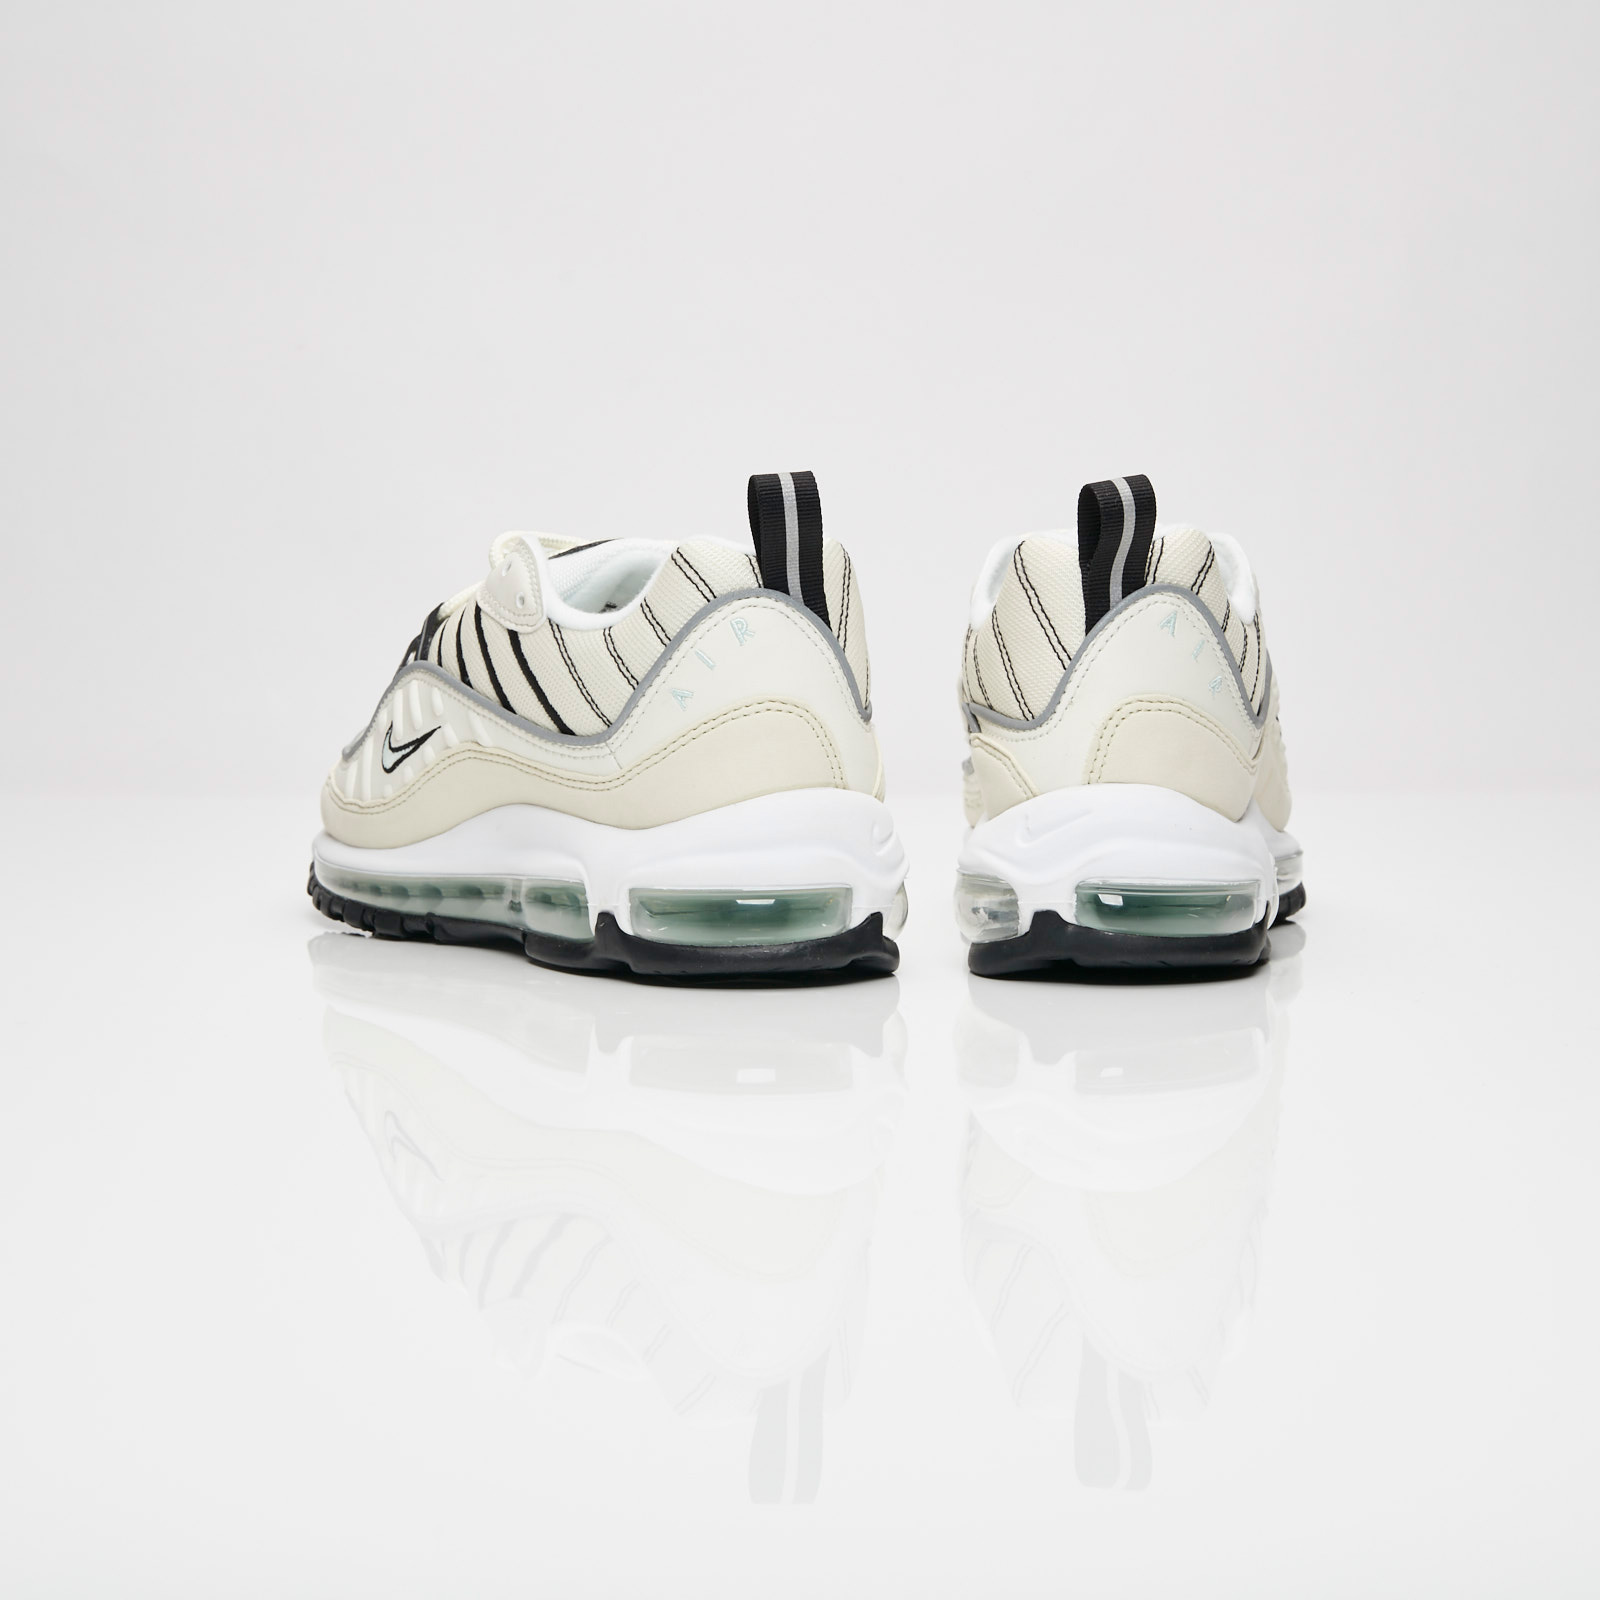 buy popular 26f3b 9f397 Nike Wmns Air Max 98 - Ah6799-105 - Sneakersnstuff   sneakers   streetwear  online since 1999